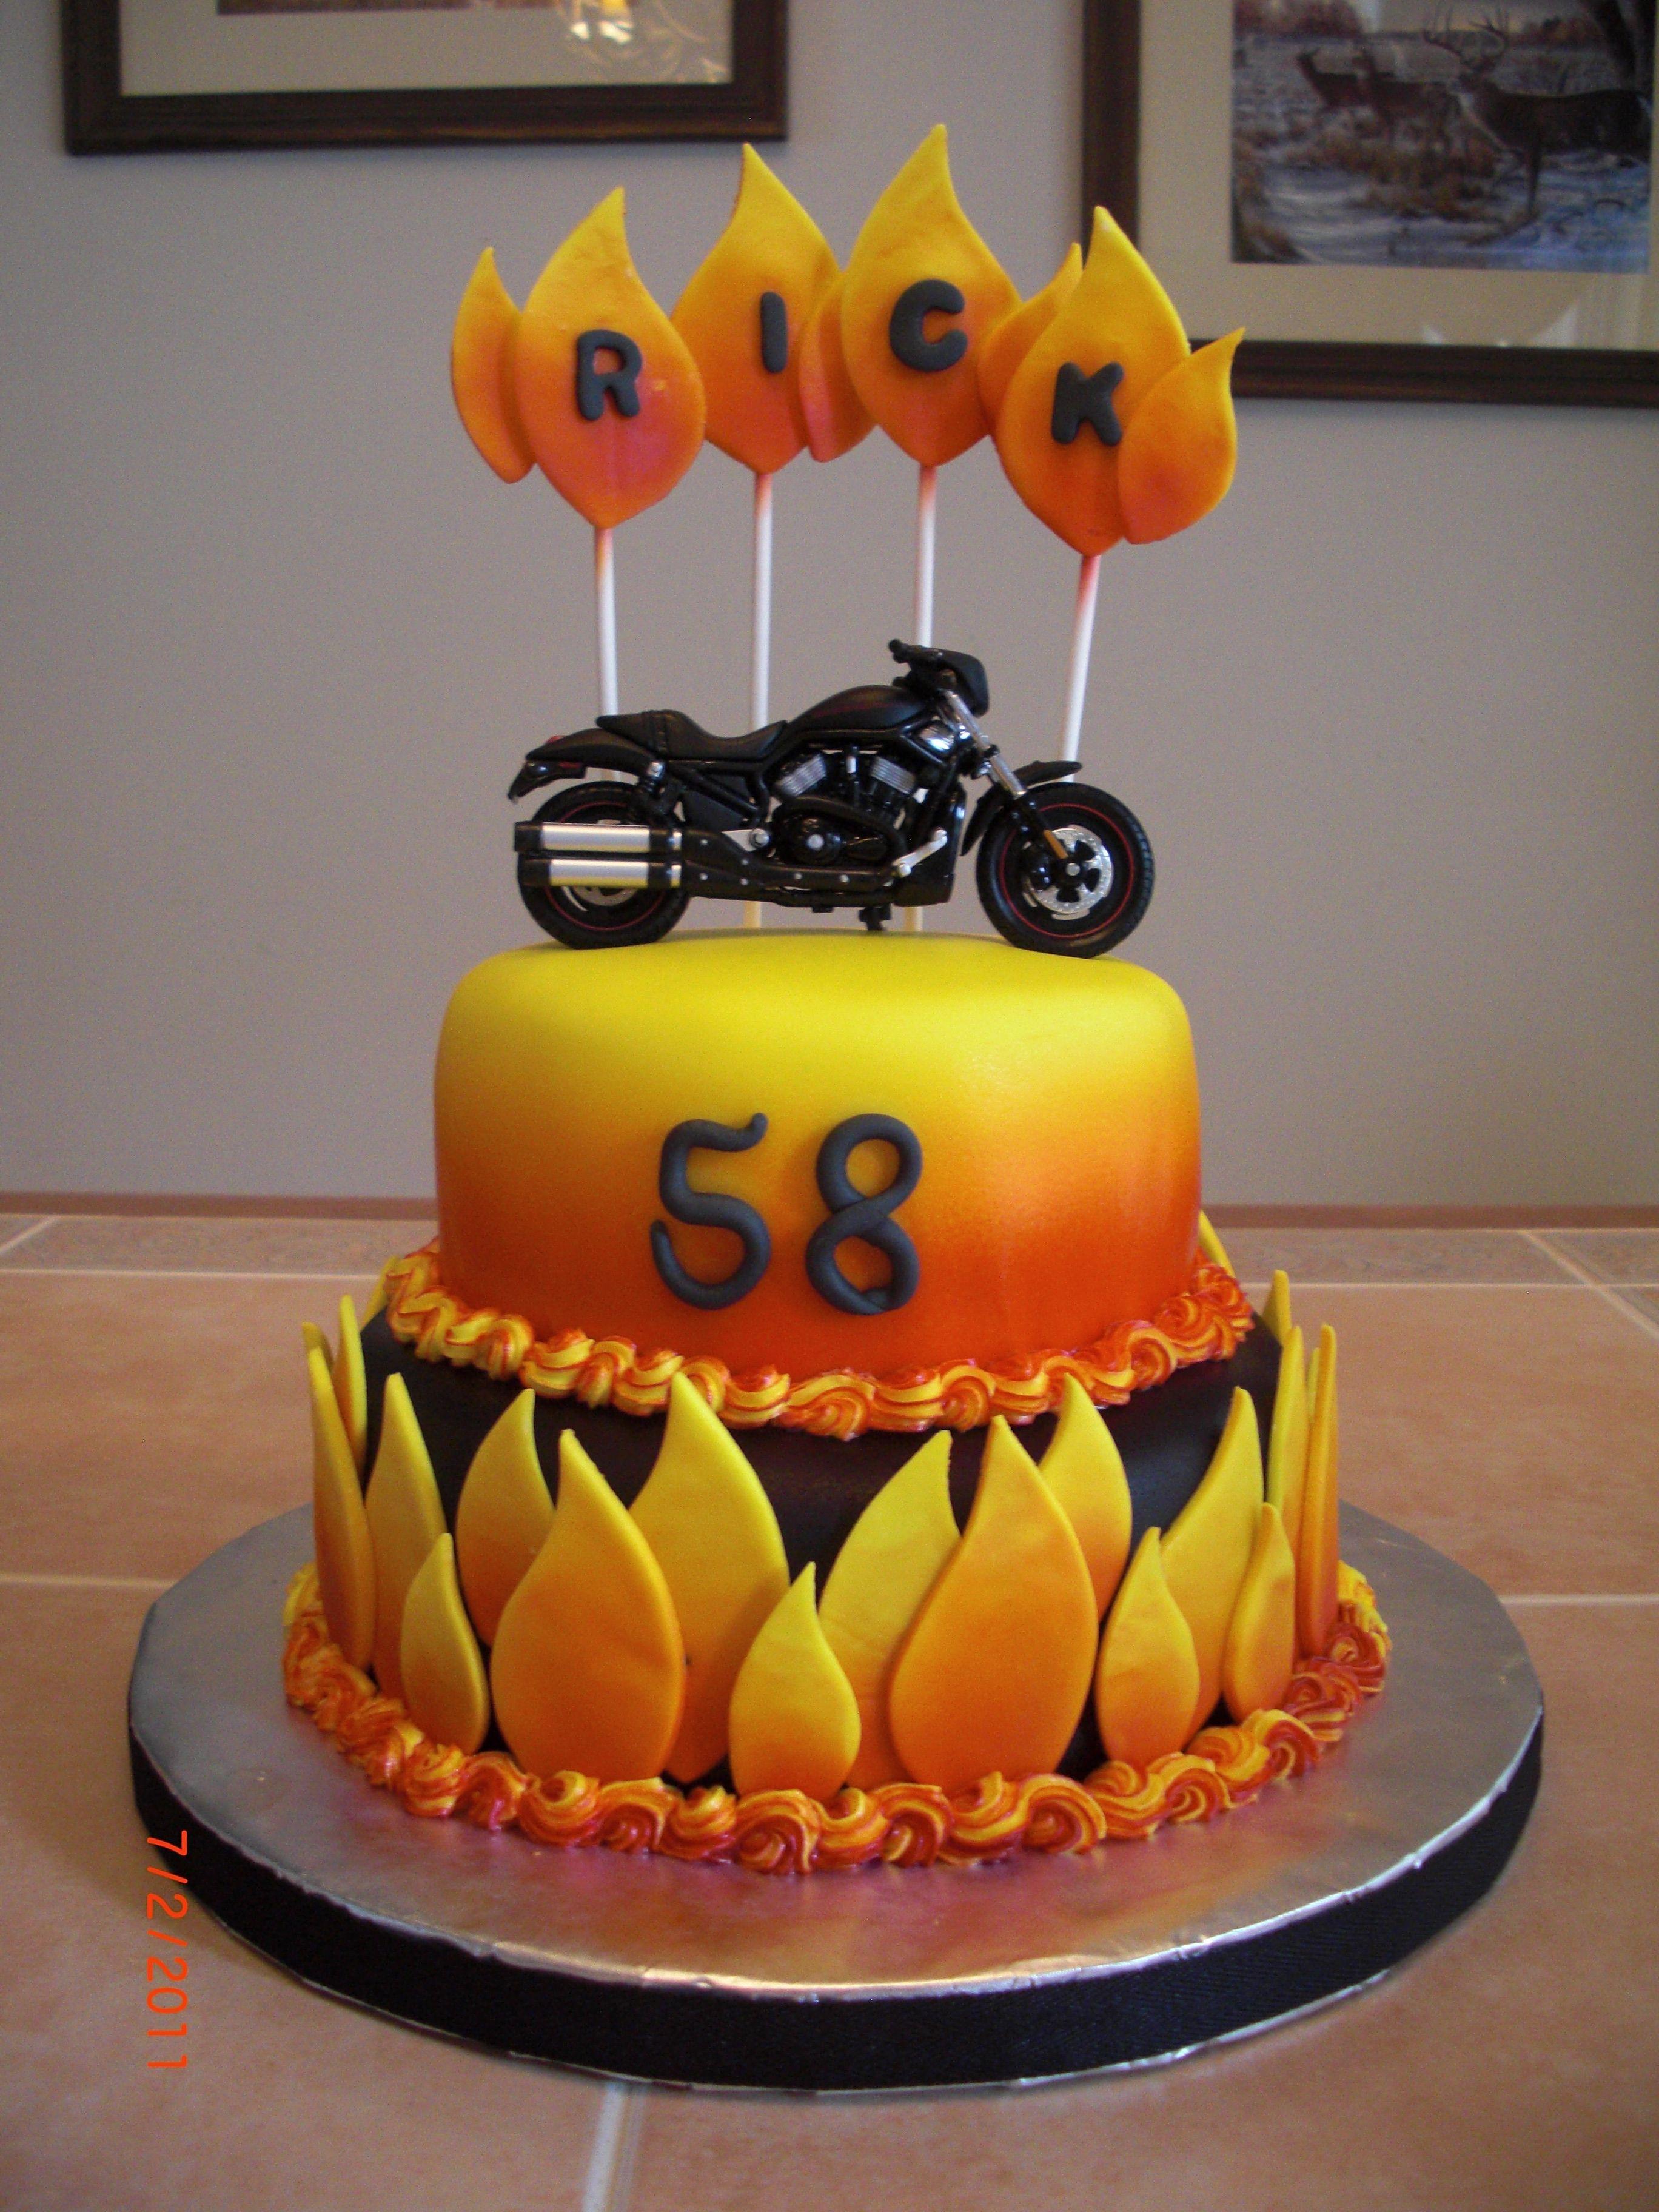 Flaming Motorcycle Cake Ghostrider Birthday Cakes Cakepins